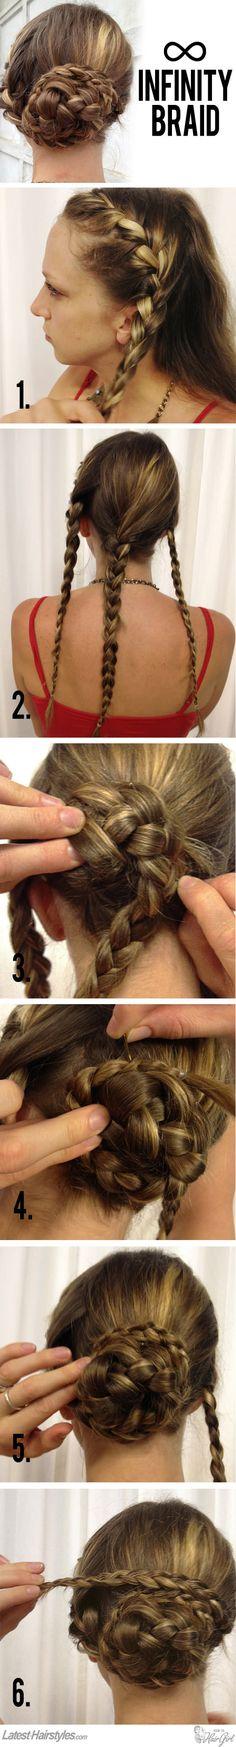 Infinity braid tutorial